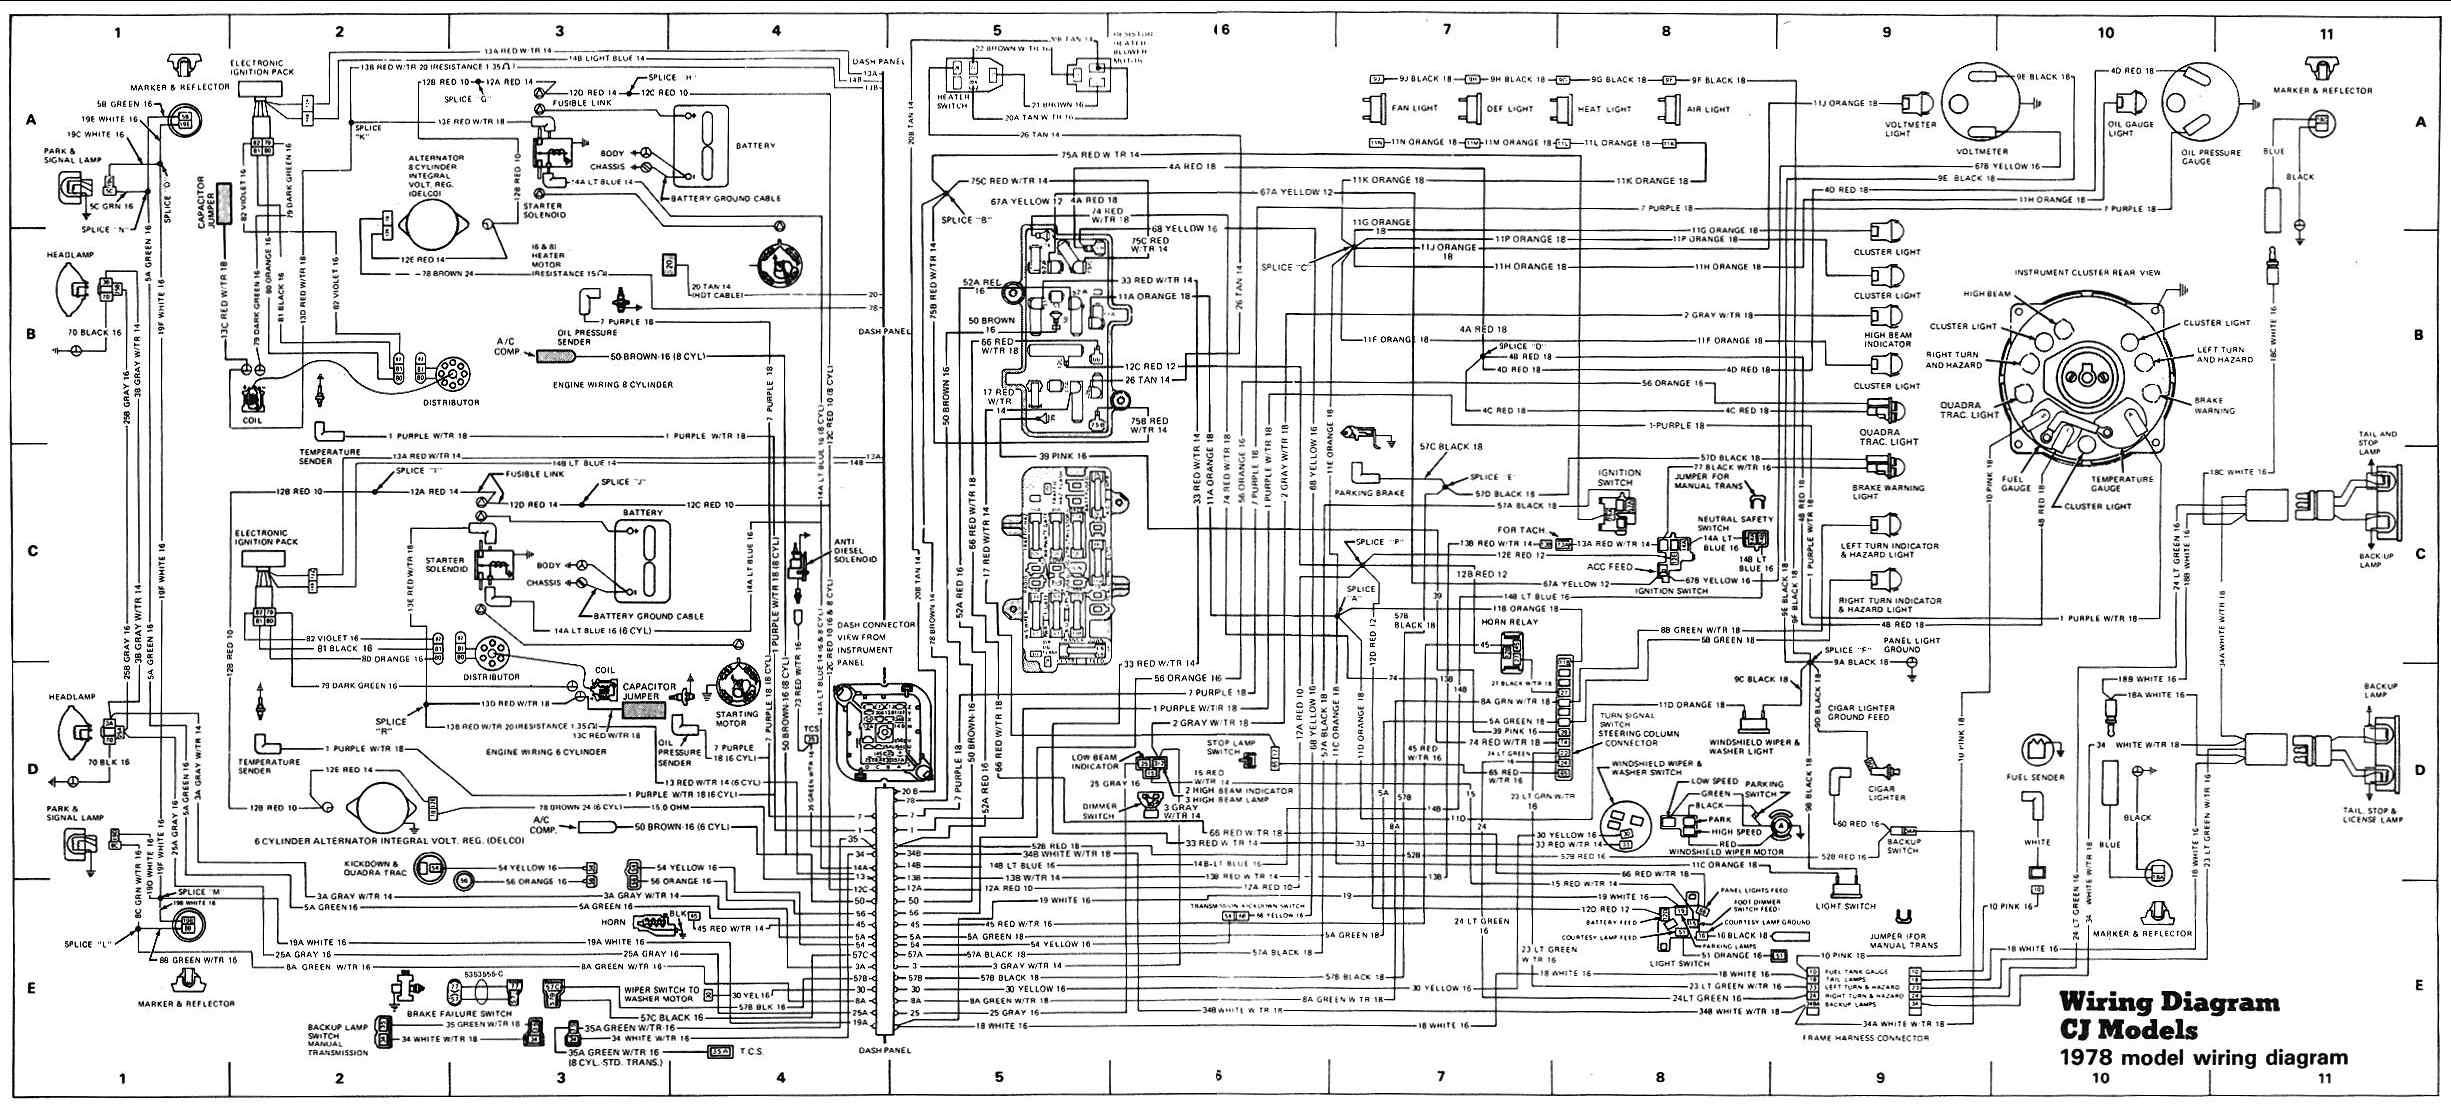 Jeepster Wiring Diagram 1949 Jeepster Wiring Diagram Wiring Diagrams